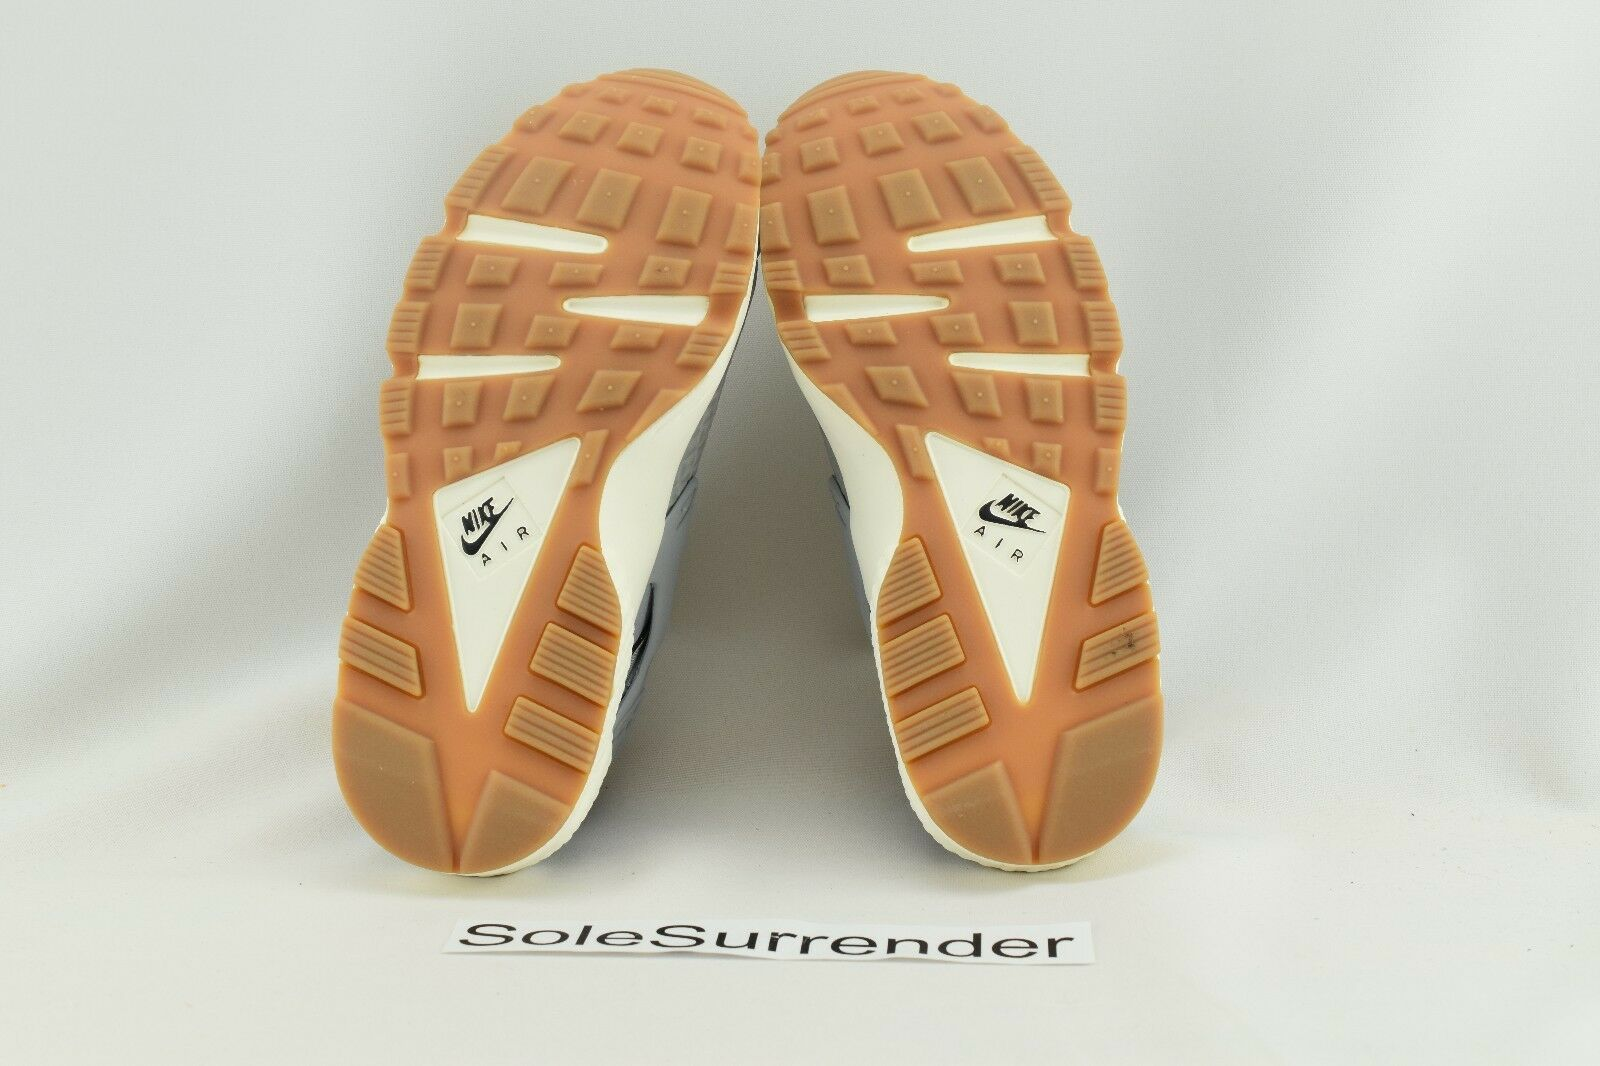 finest selection 0c84a 59e15 ... Women s Nike Air Huarache Huarache Huarache Run PRM - SIZE 6 -NEW-  683818- ...